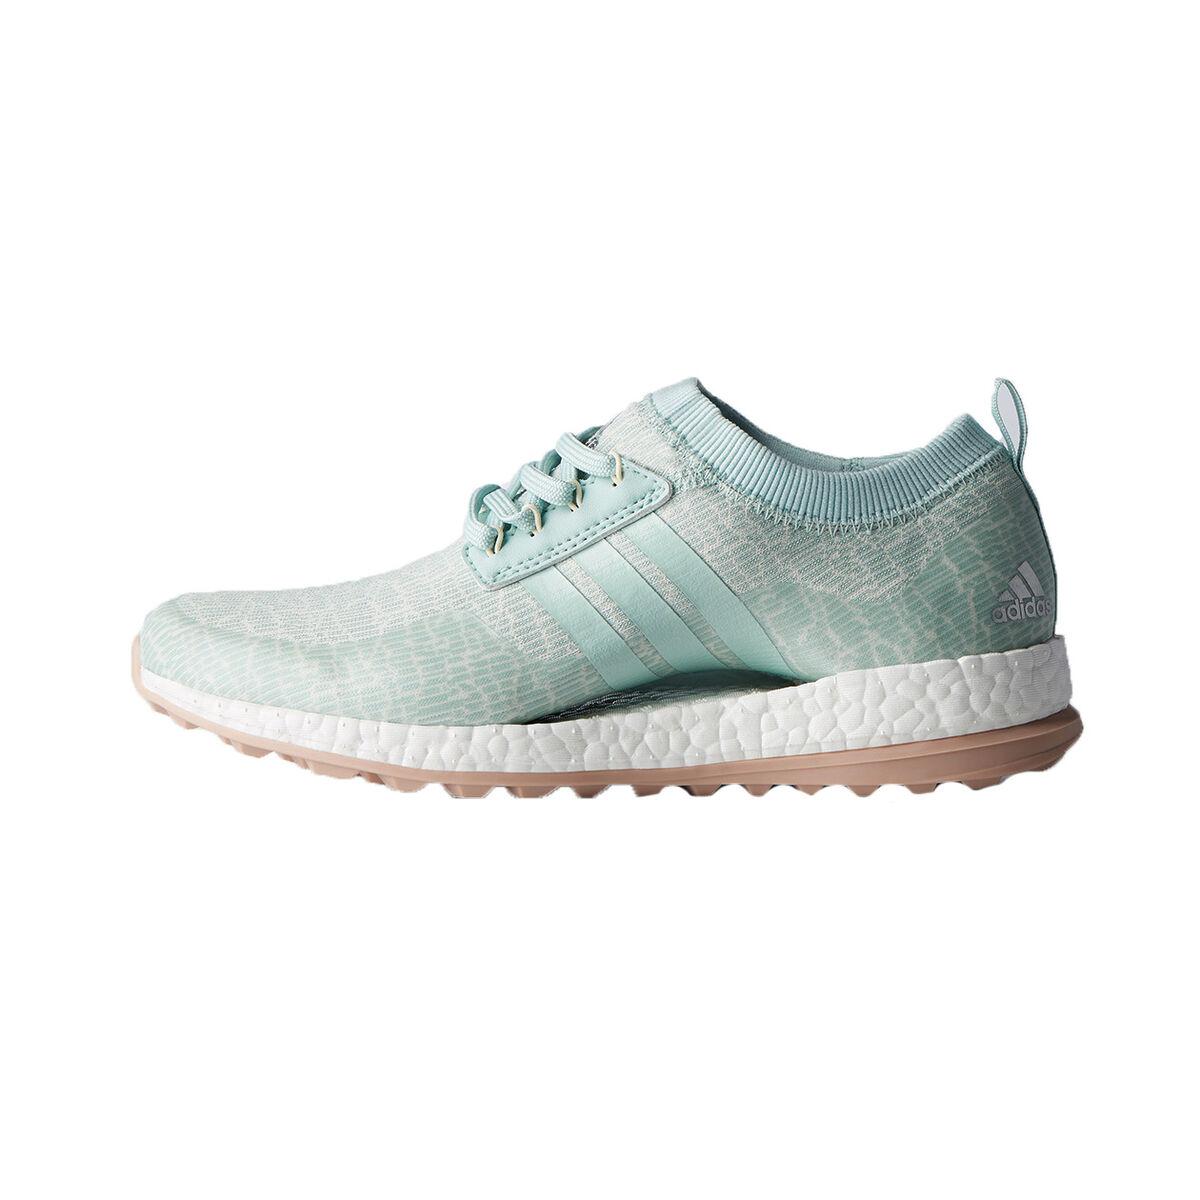 5c183e5ff3896 Images. adidas Pure Boost XG Women  39 s Golf Shoe - Light Green